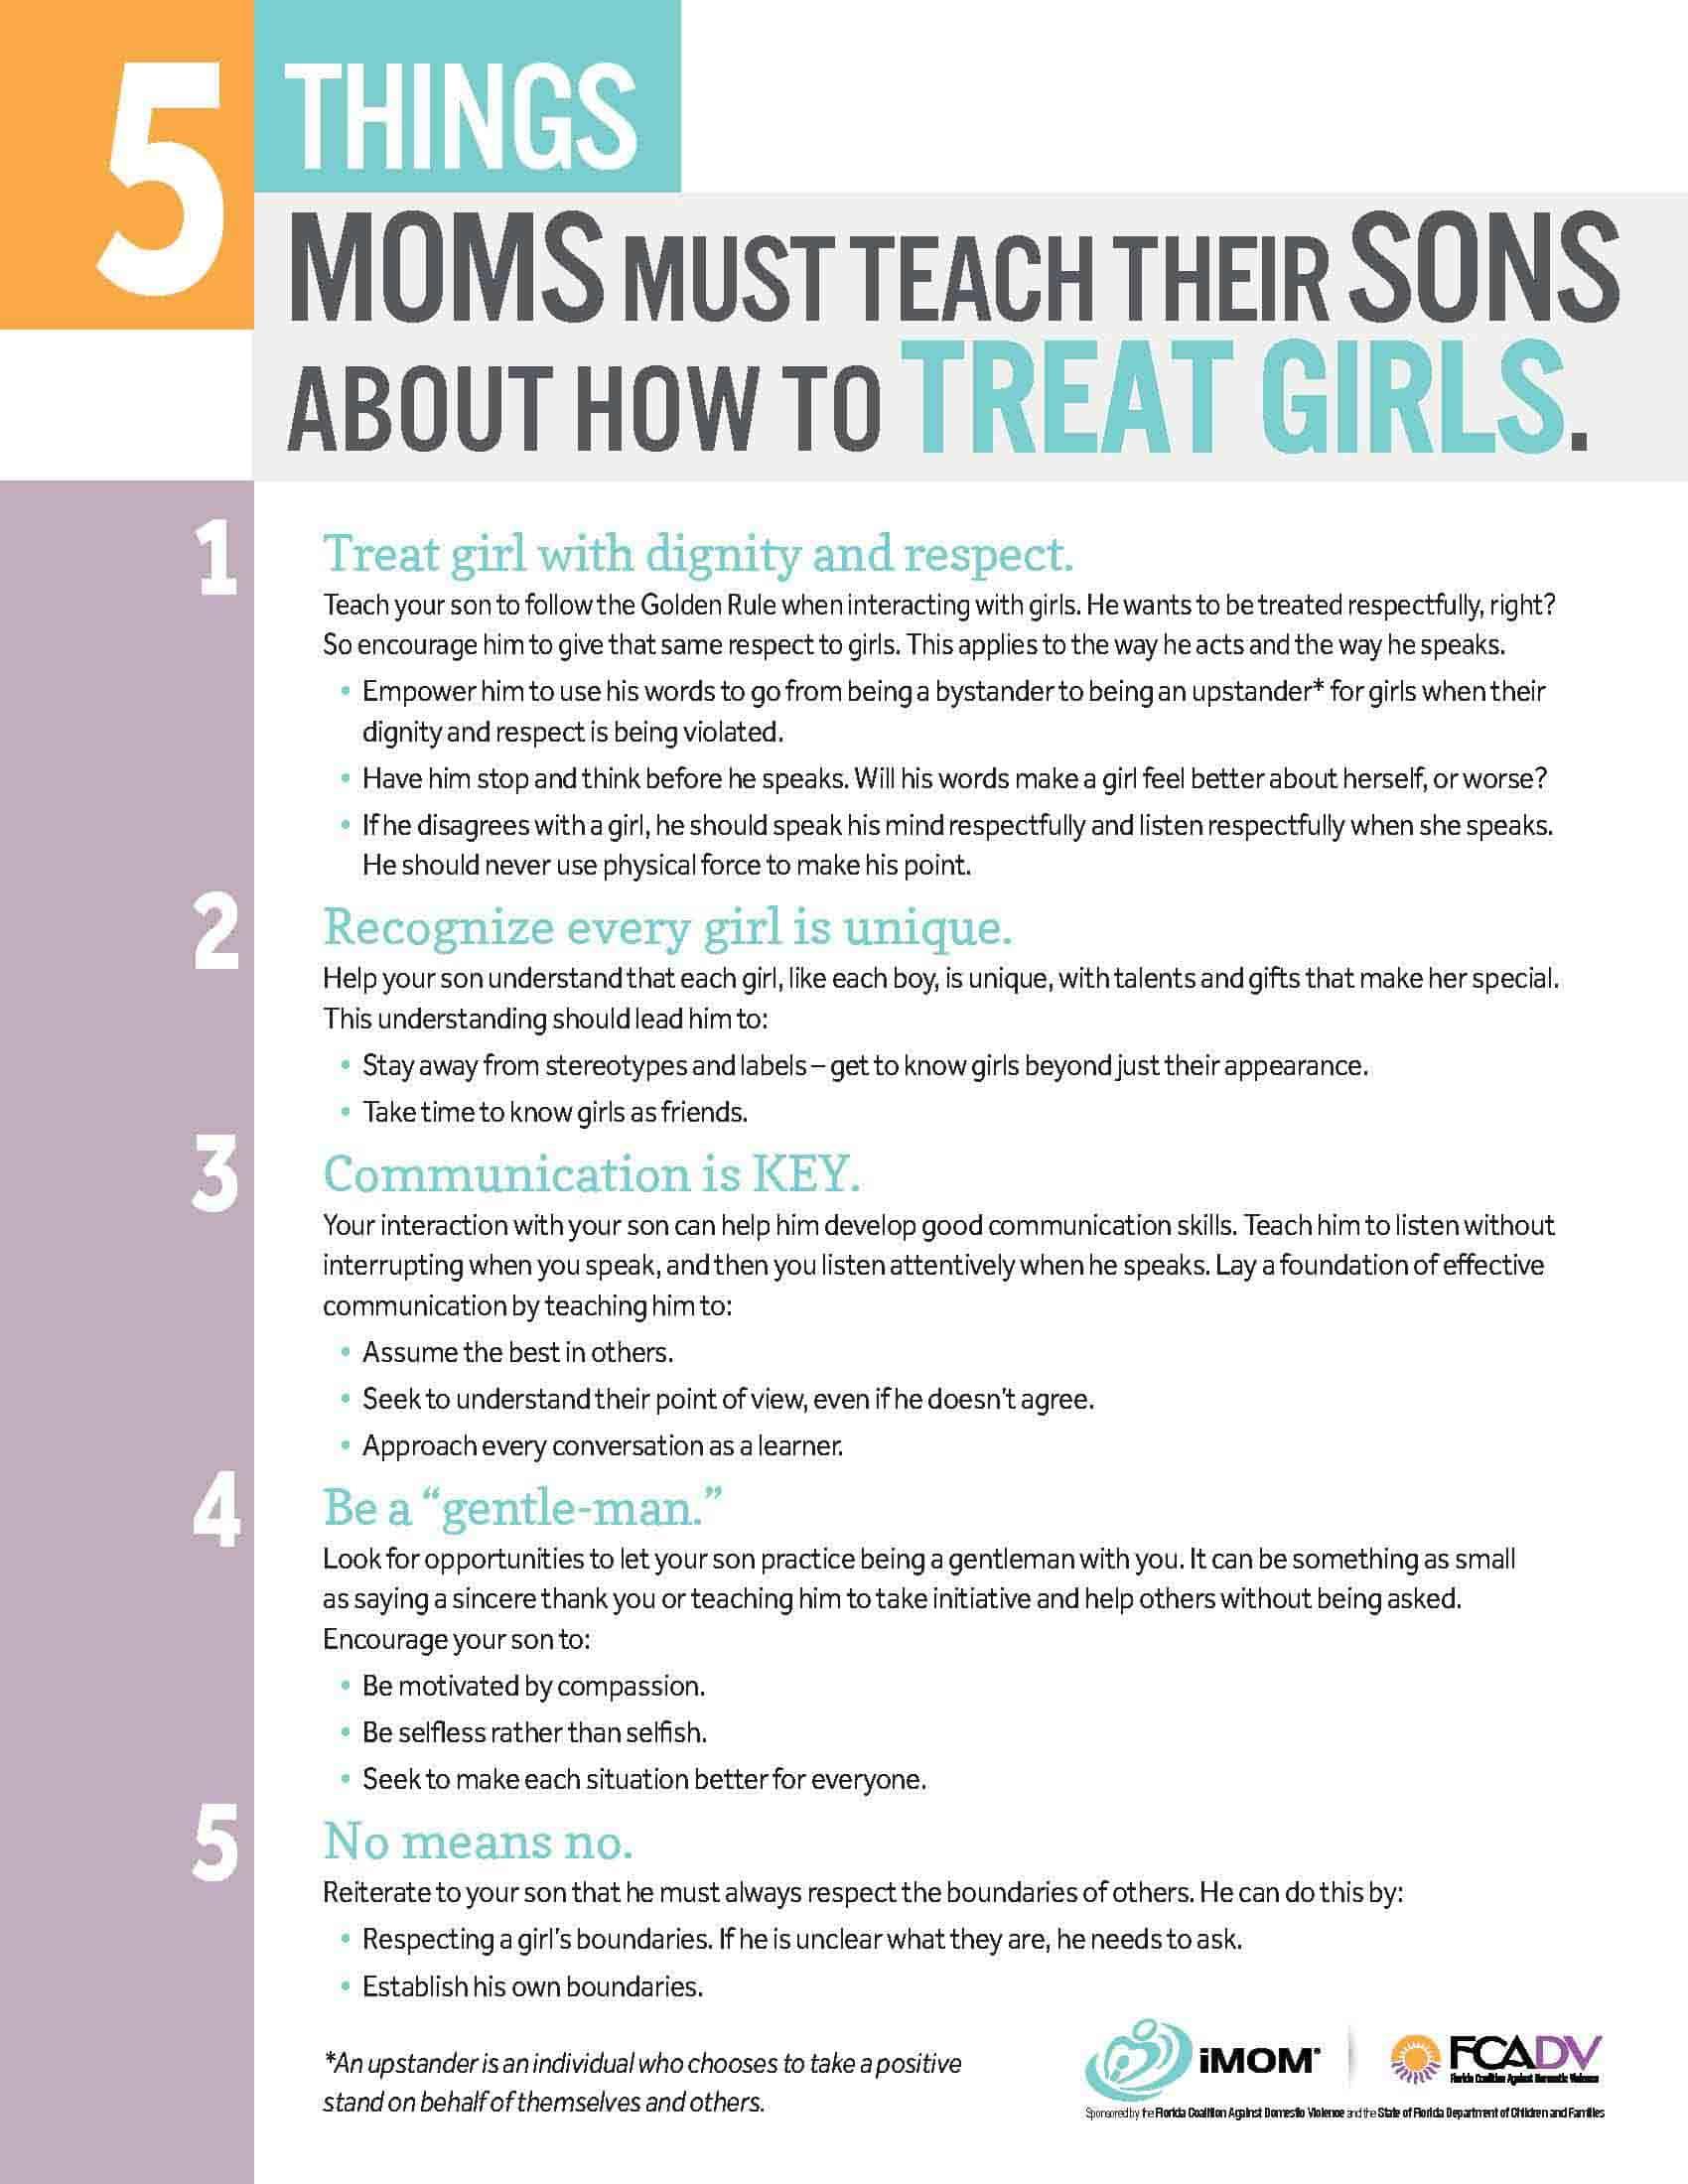 5 Things Moms Must Teach Their